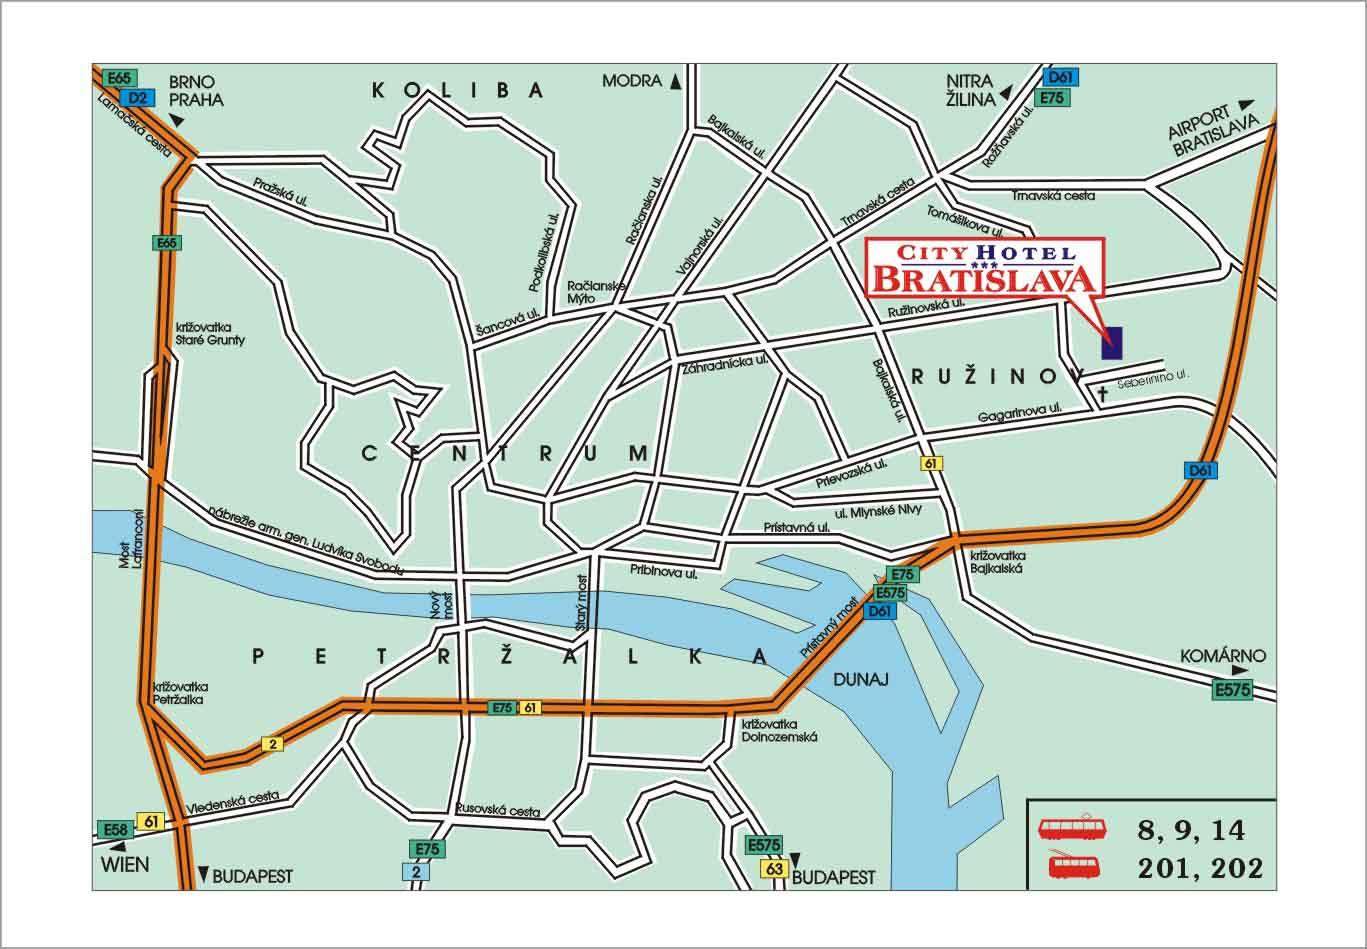 Bratislavainfo Bratislava map street map of Bratislava